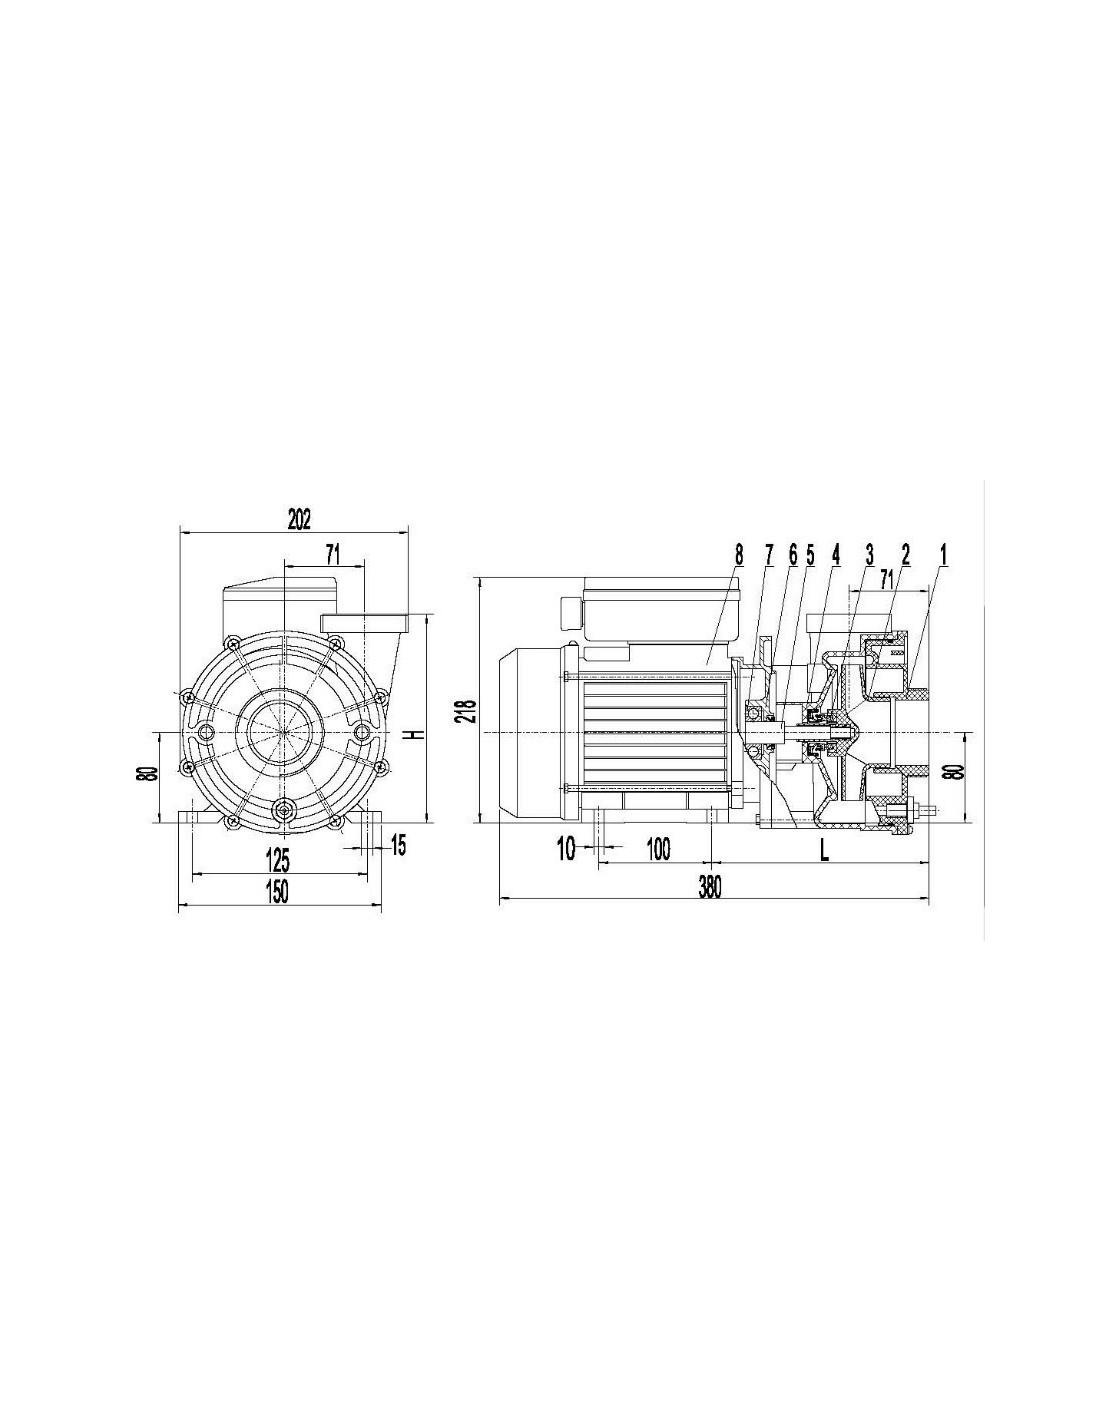 Lx Whirlpool Bath Pump Wiring Diagram Detailed Diagrams Hot Tube Wire Water Lp300 Spa Tub Electric Range Spas